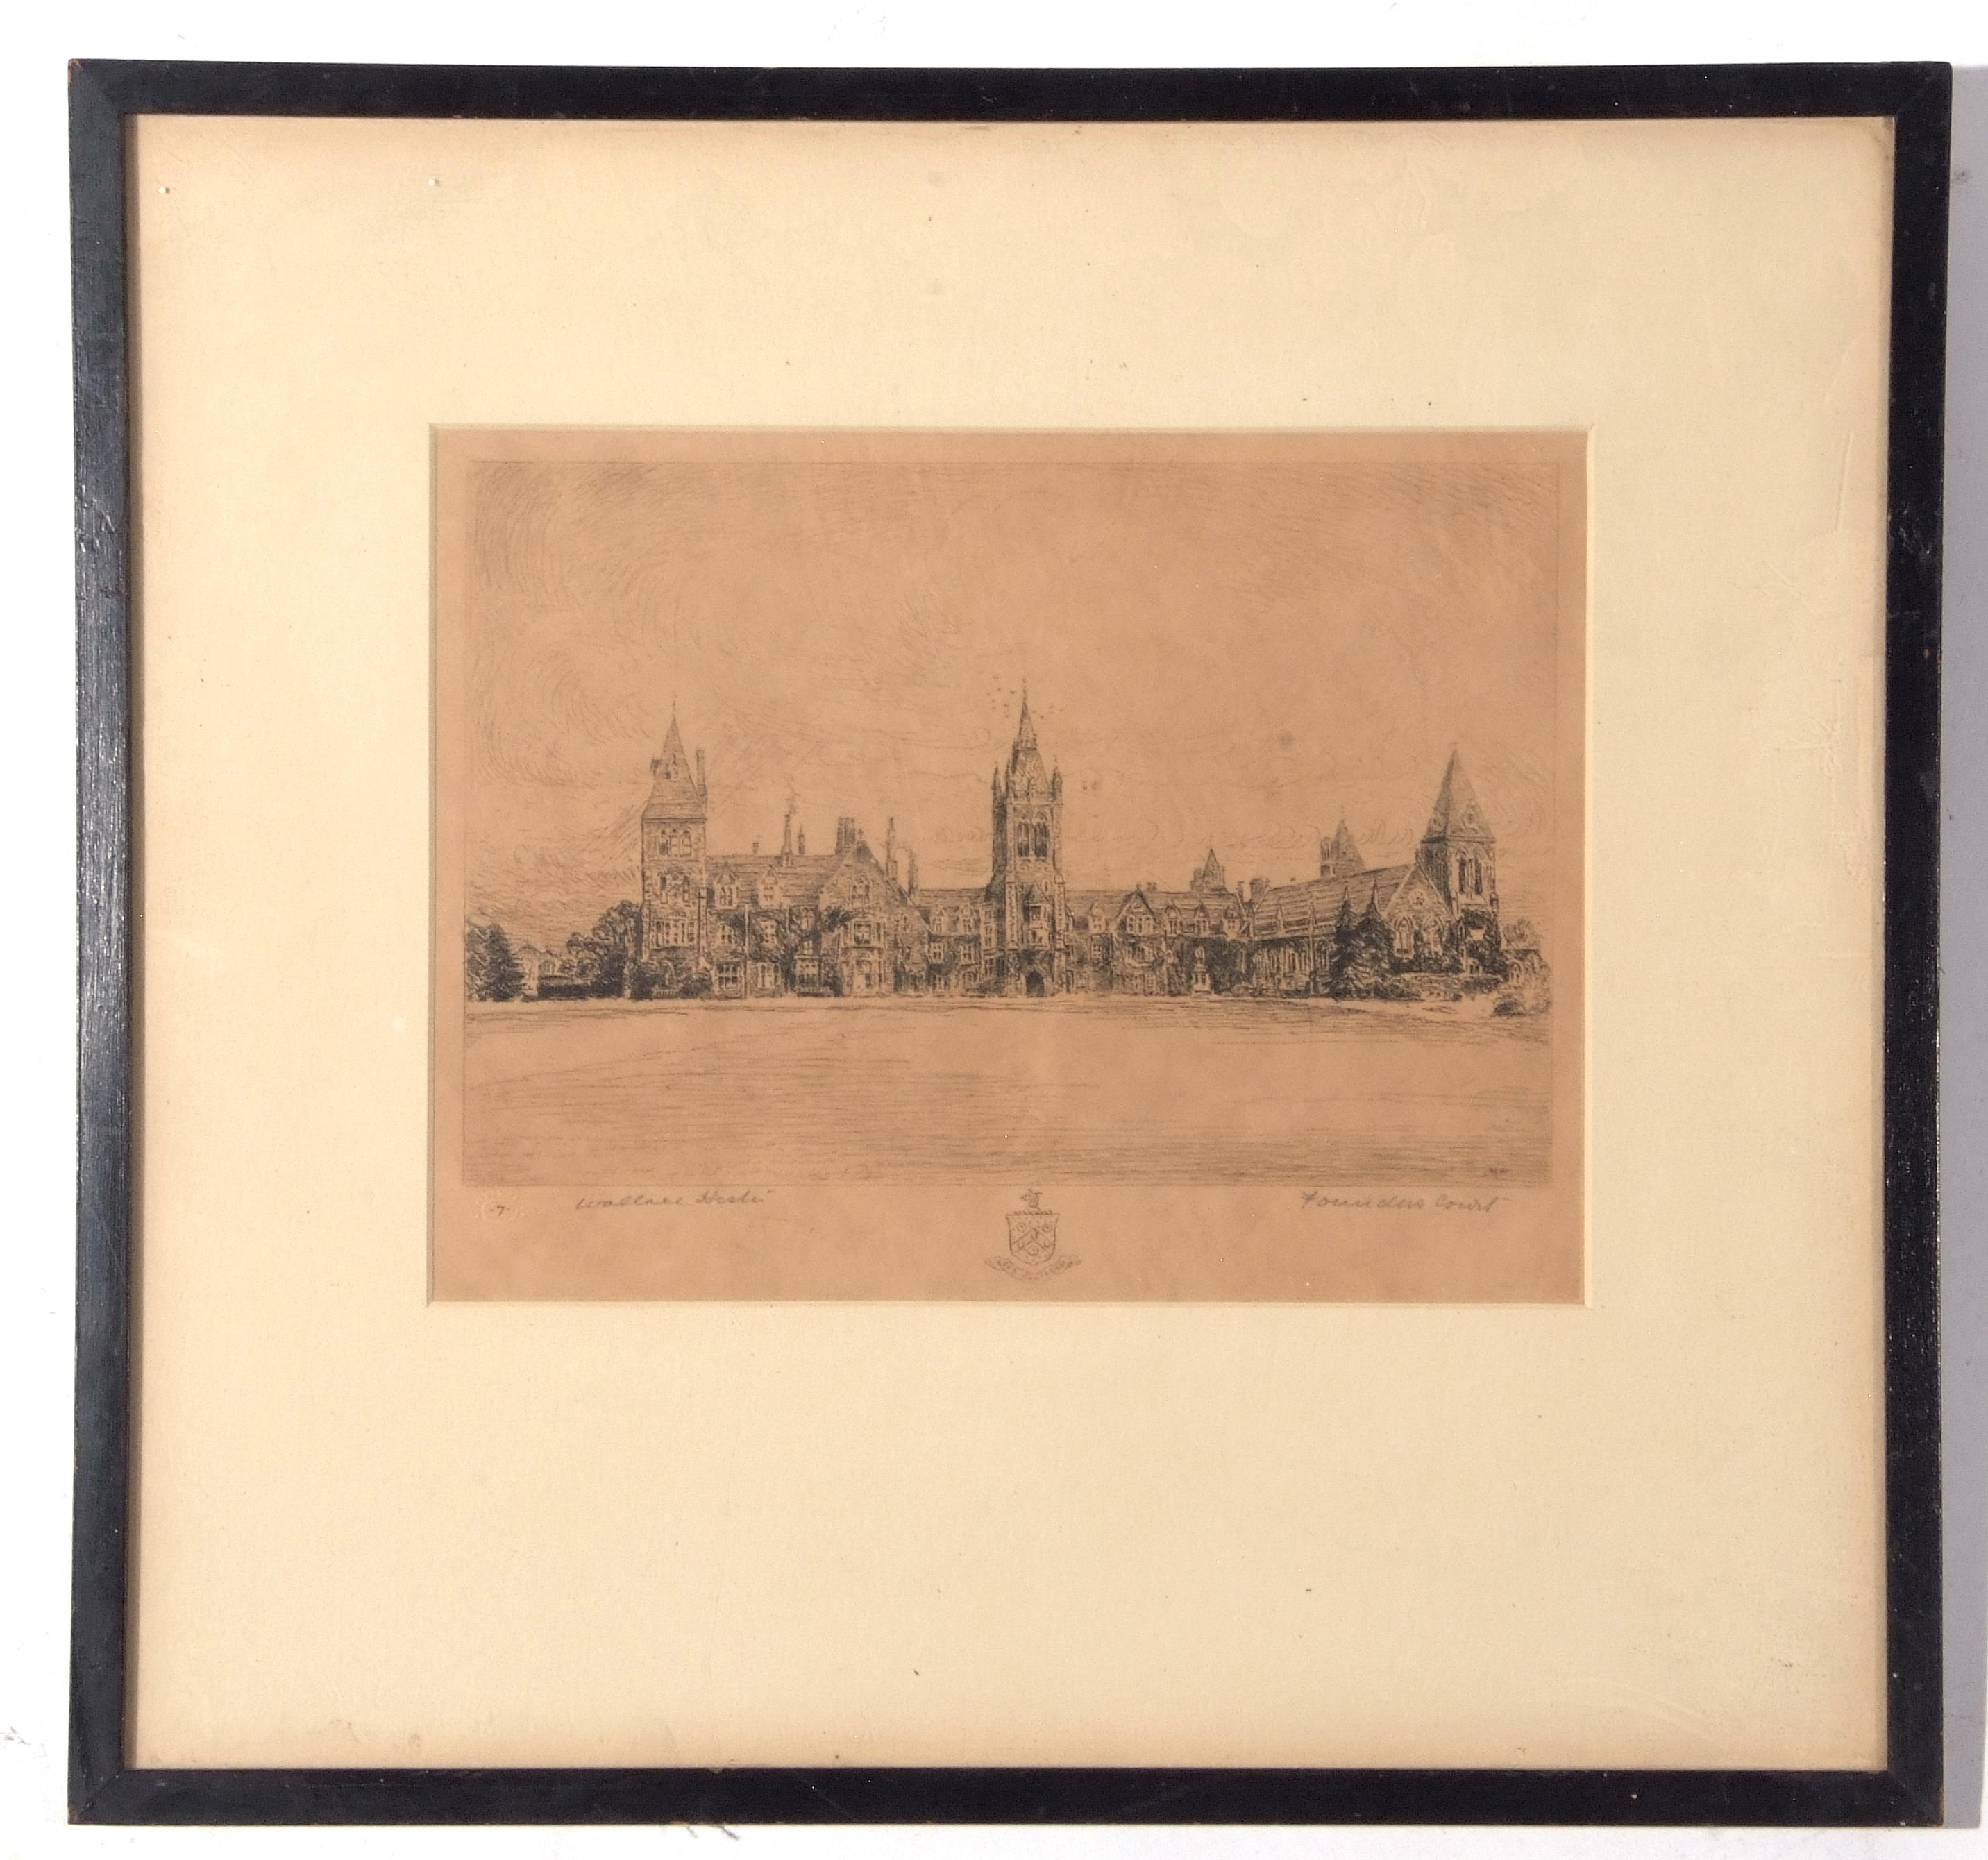 Three framed etchings, views of Charterhouse School, each 20 x 26cm